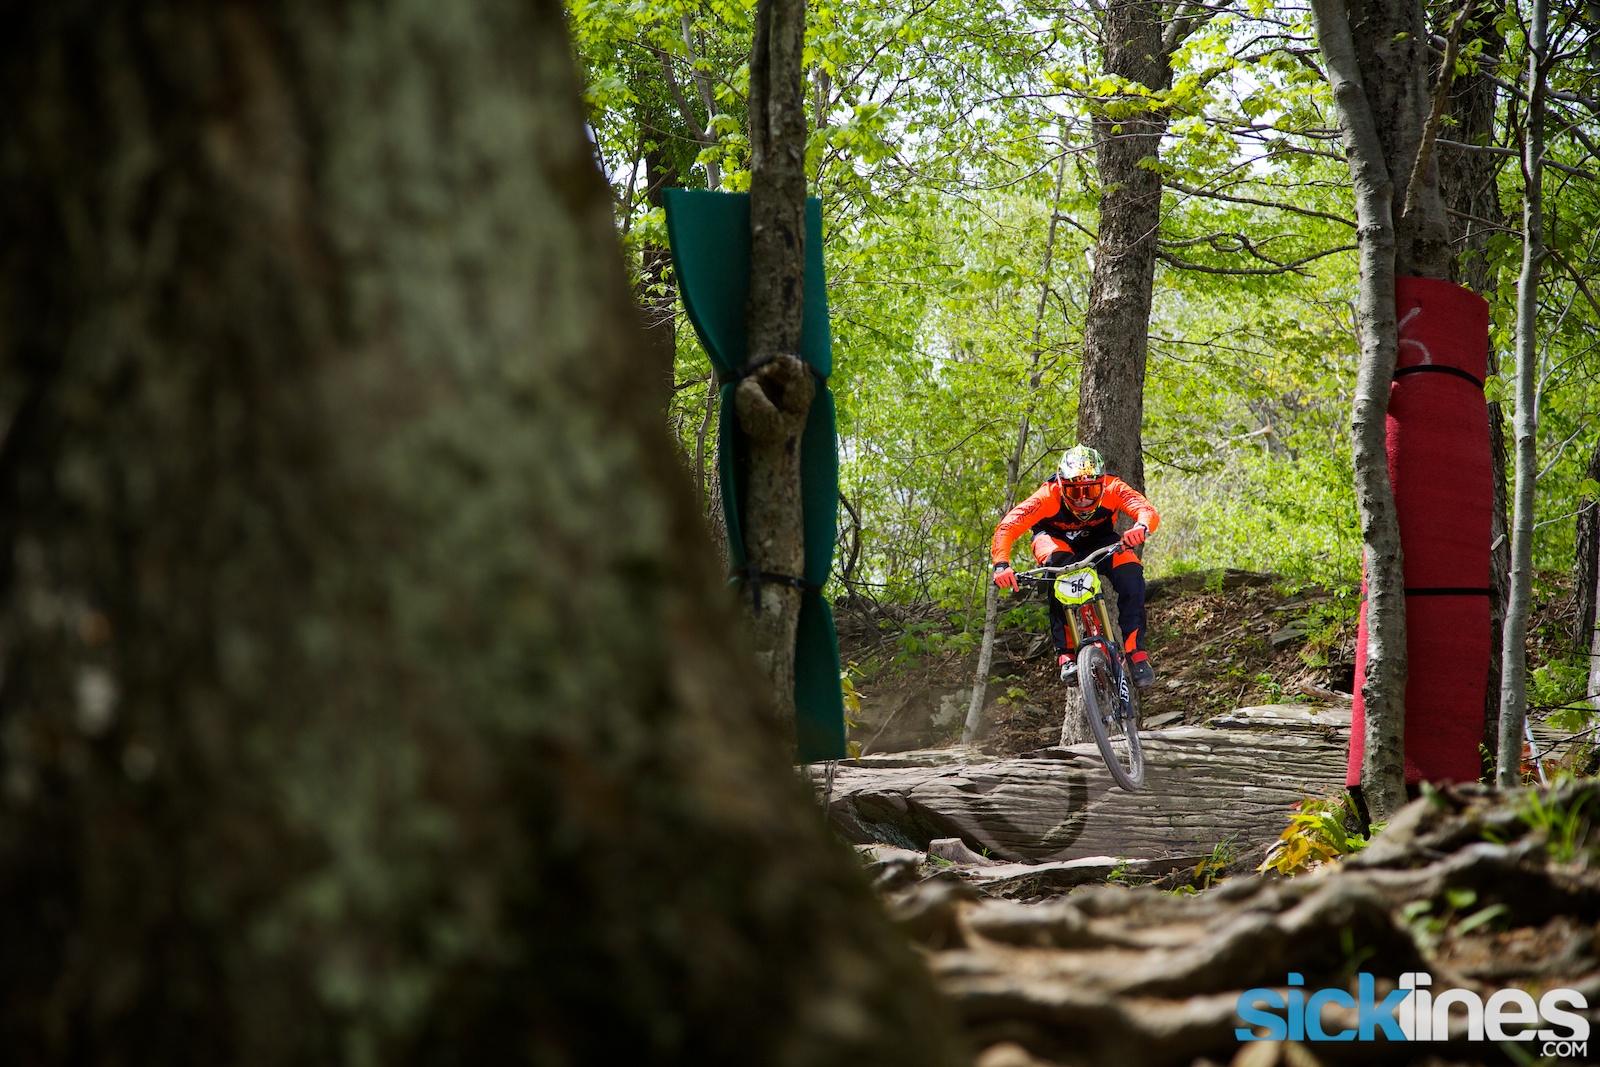 , Liftopia – Purchase Discounted Mountain Bike Lift Tickets – Plattekill, Mountain Creek, Mammoth, Beech Mountain, and More